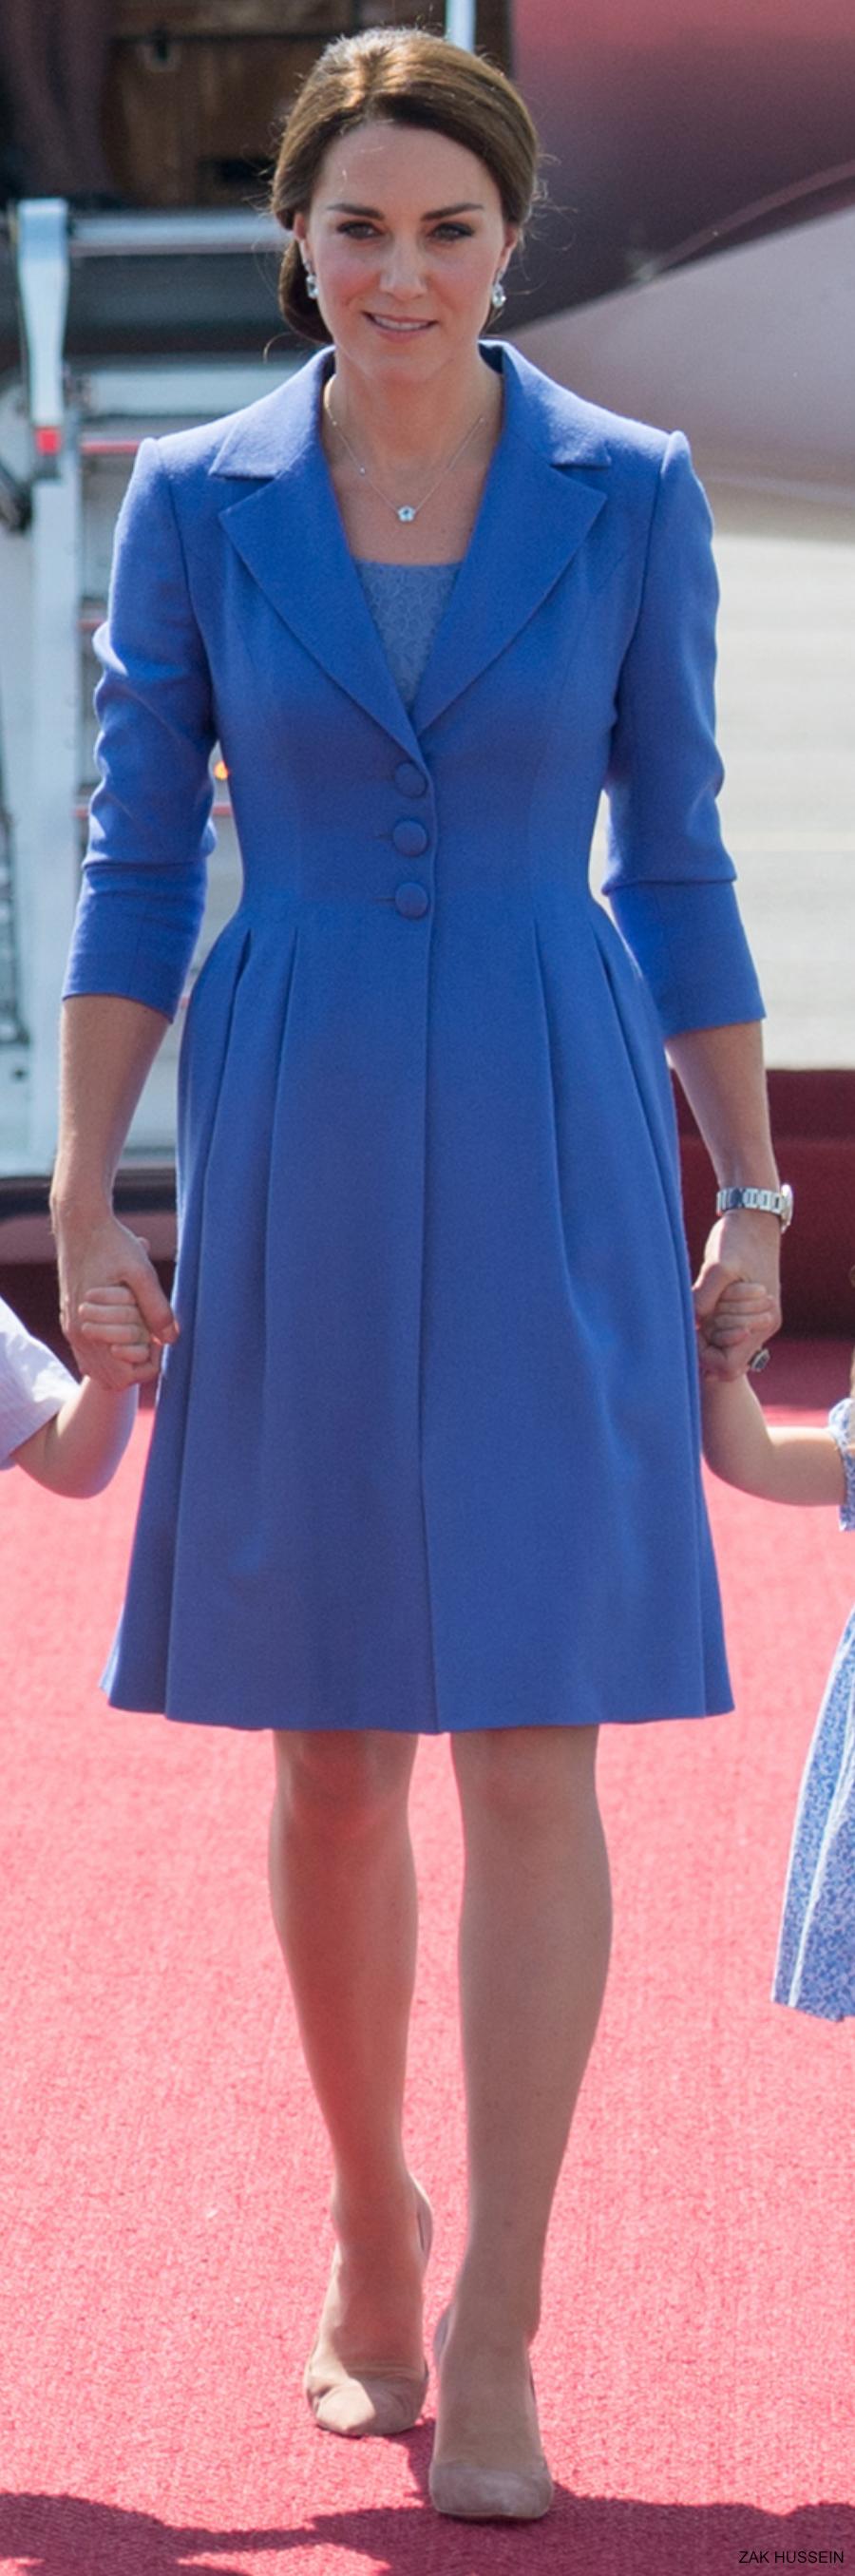 Kate Middleton wearing her cornflower blue Catherine Walker and Co coat in Berlin, Germany